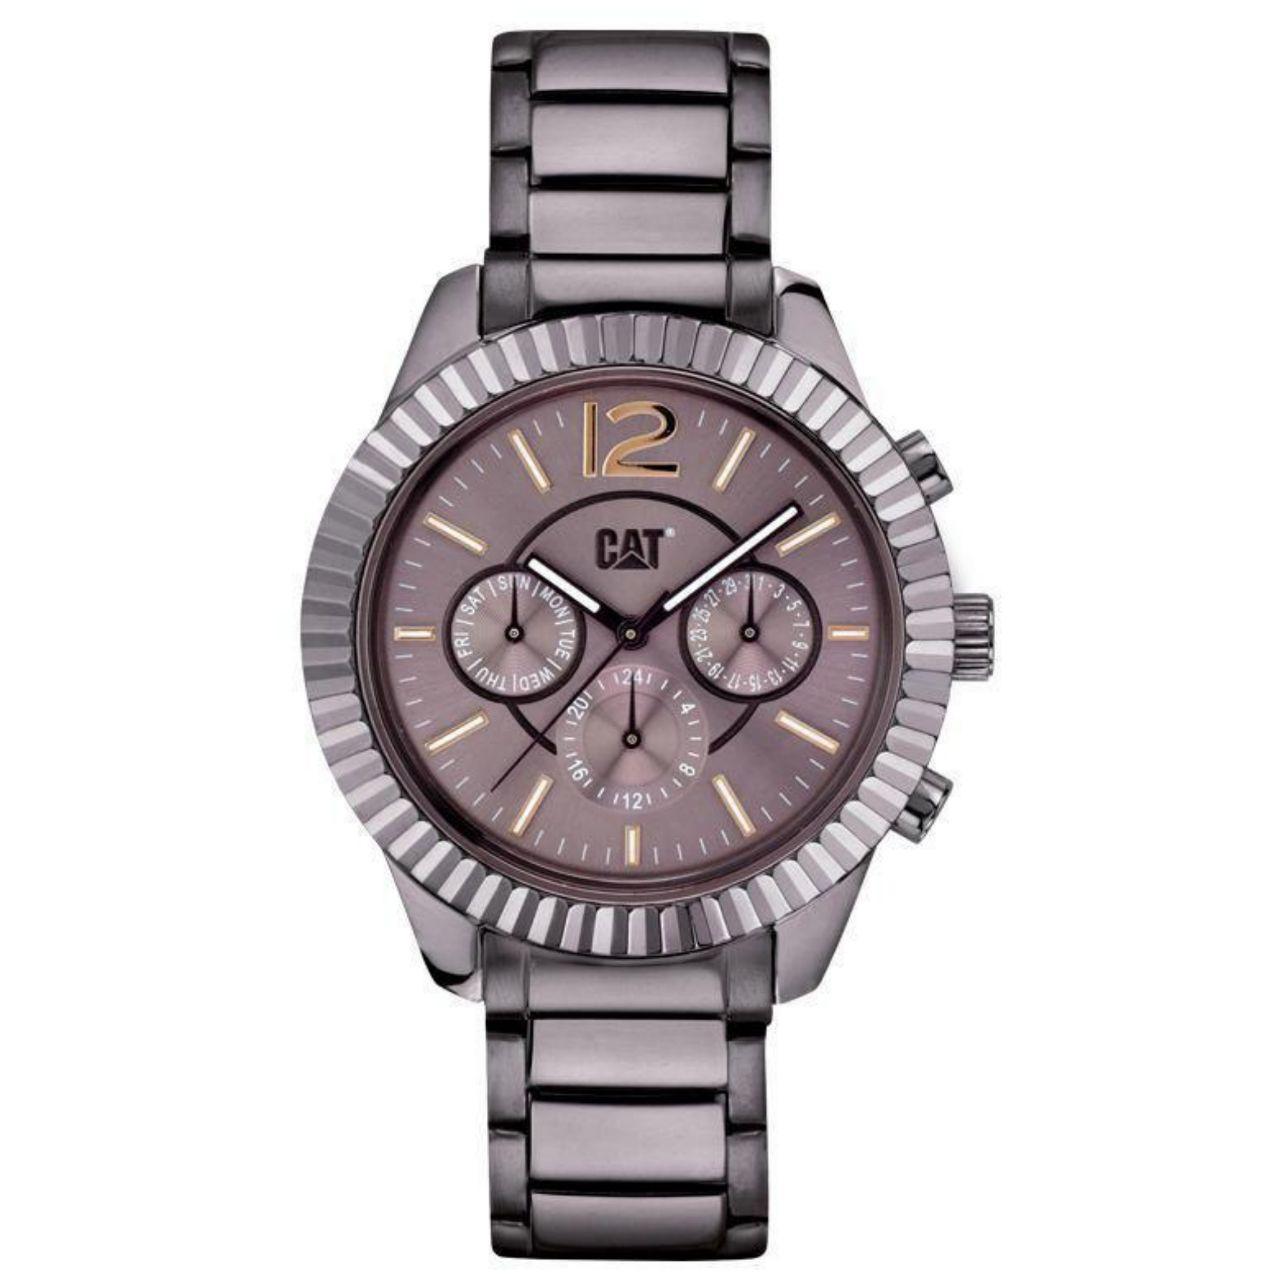 ساعت مچی عقربه ای زنانه کاترپیلار مدل L6.309.10.020